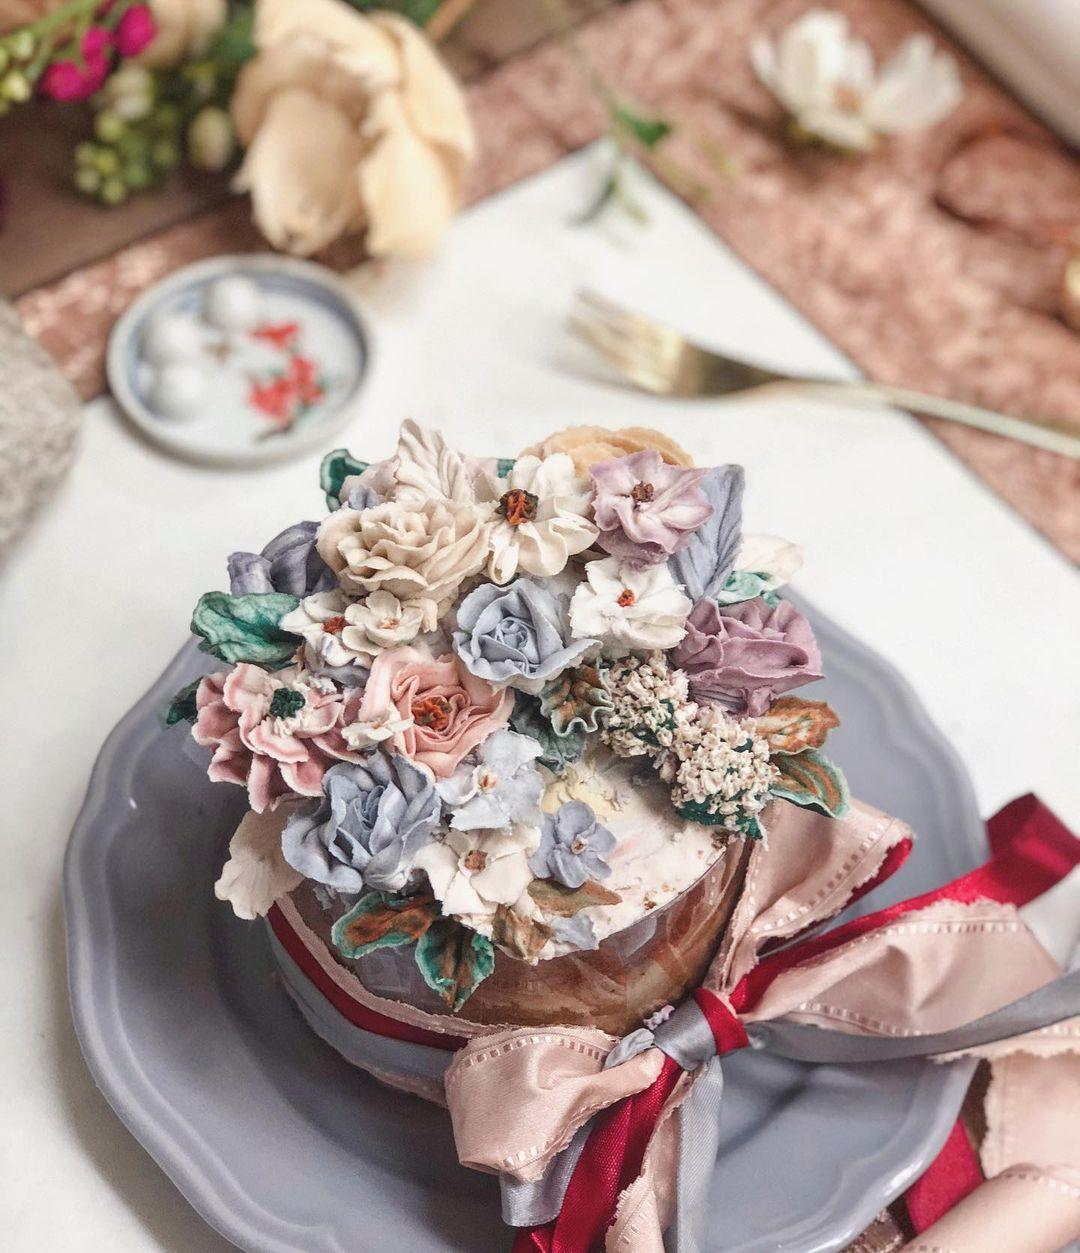 BYJHK 花蛋糕 生日  生日蛋糕